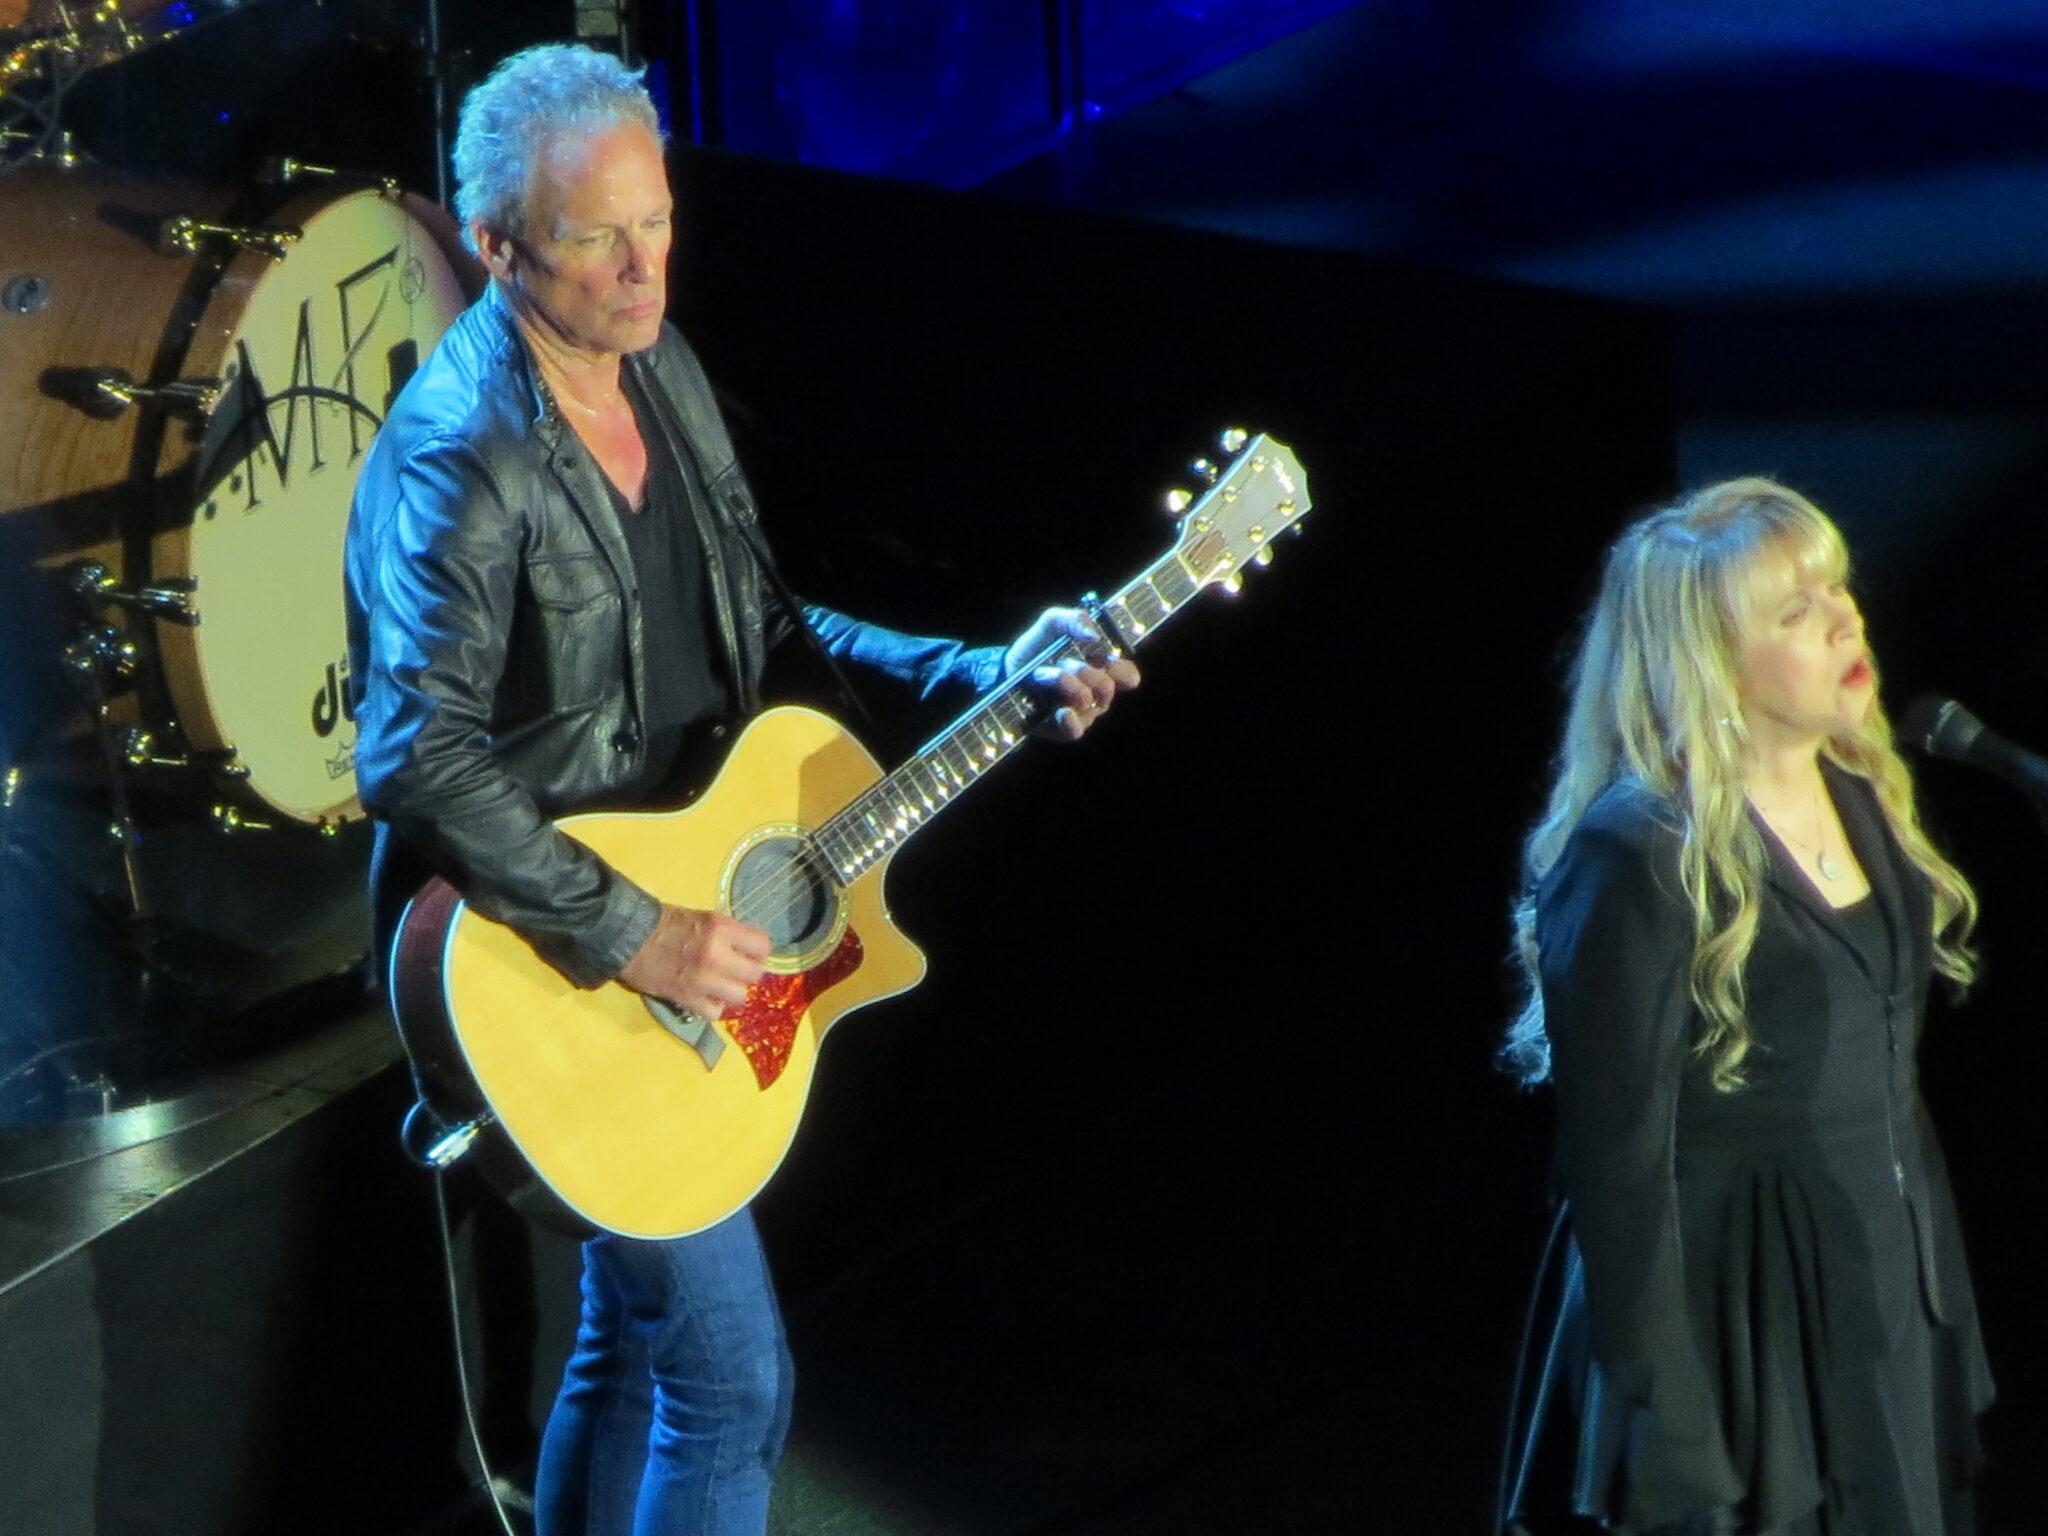 John Buckingham and Stevie Nicks, Fleetwood Mac